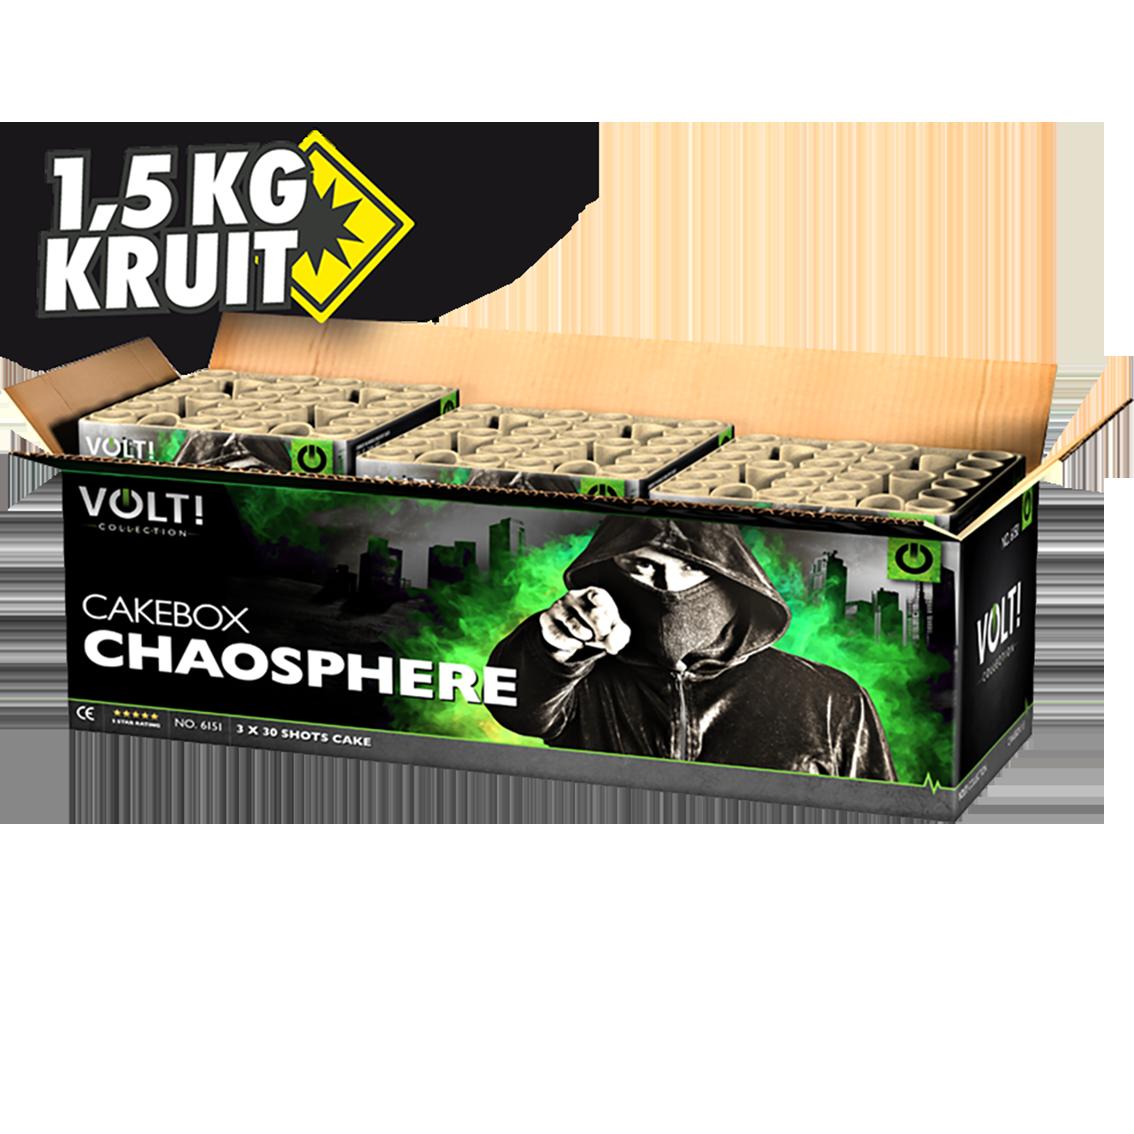 Volt Chaosphere box